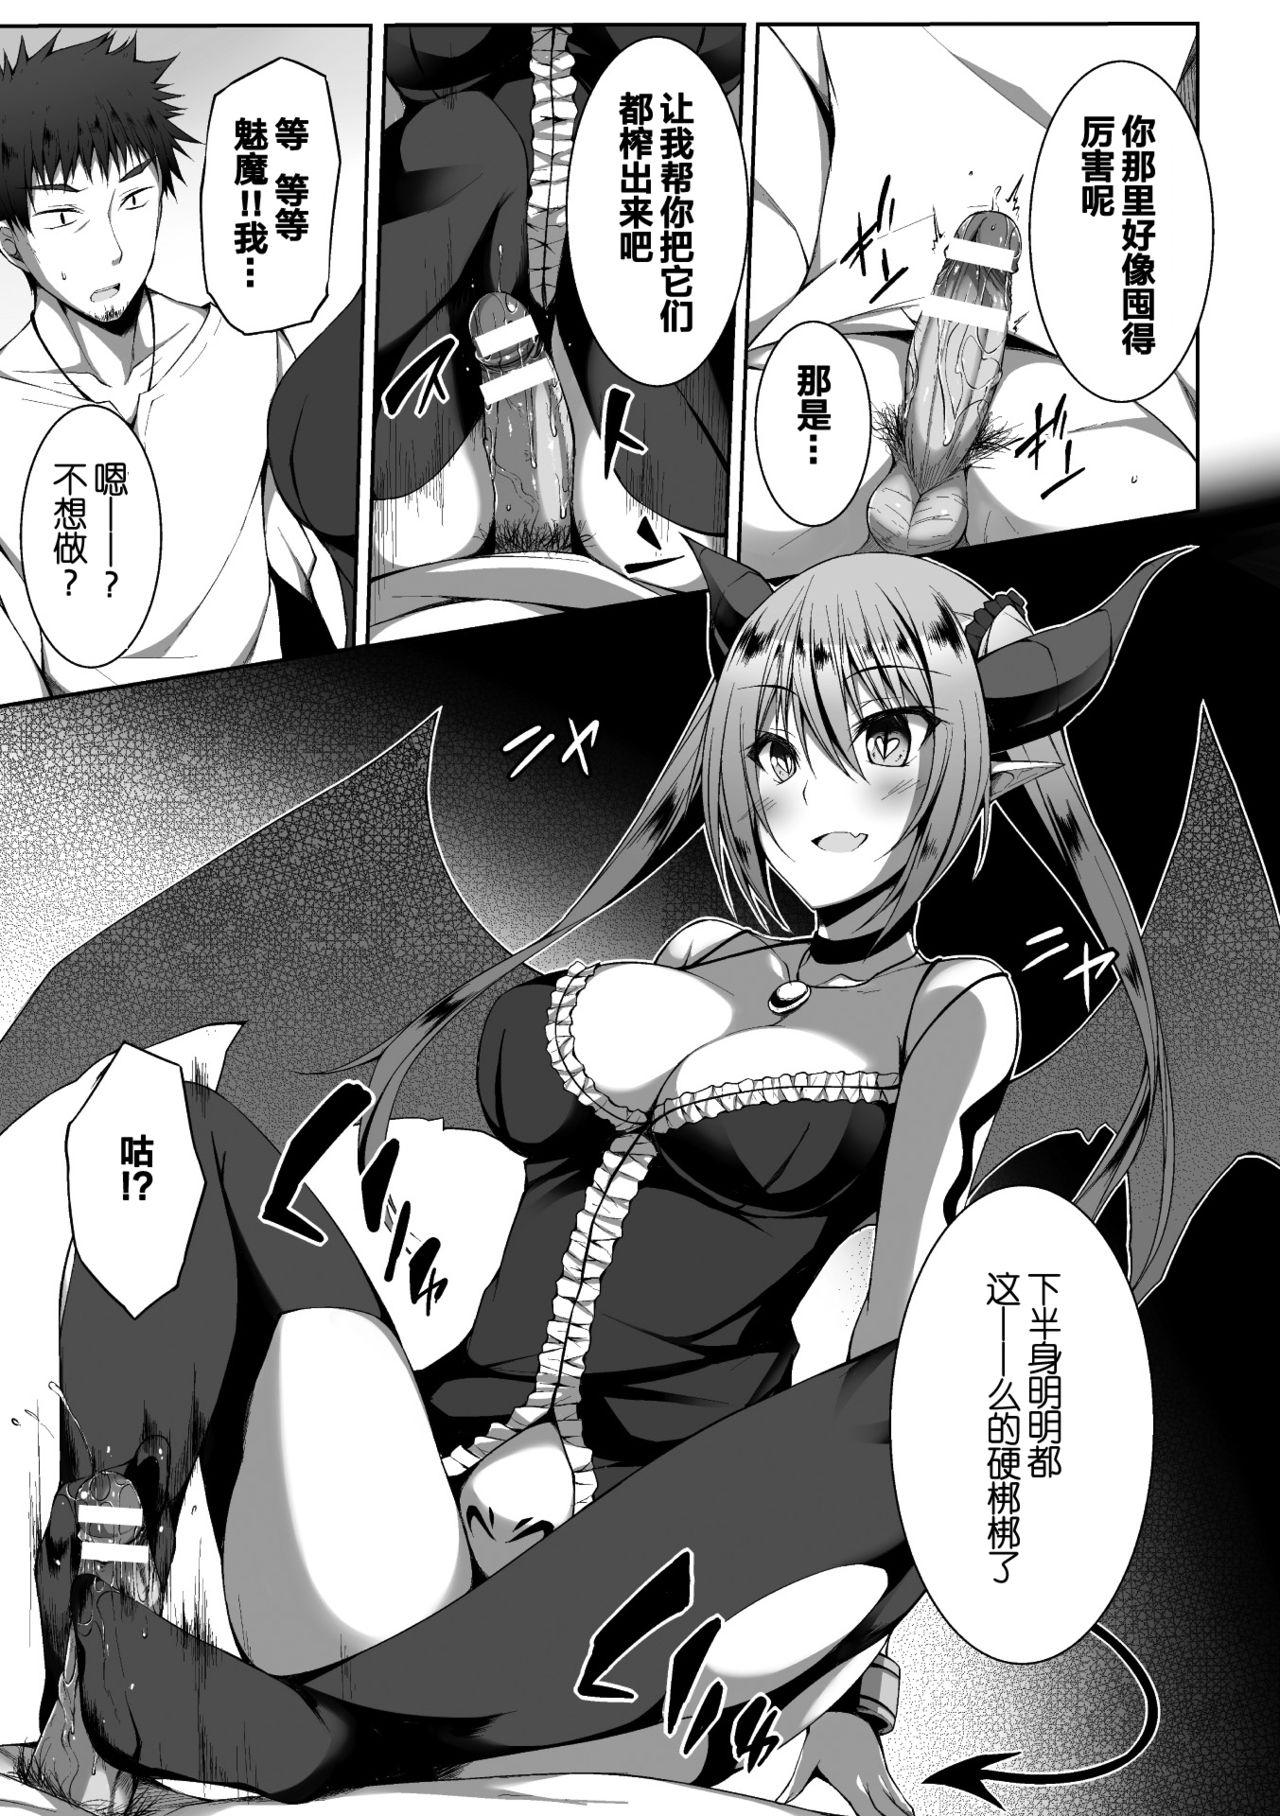 [Anthology] 2D Comic Magazine Tenshi ni Ochiru Akuma-tachi Vol. 1 Ch. 1-2 [Chinese] [这很恶堕汉化组] [Digital] 6